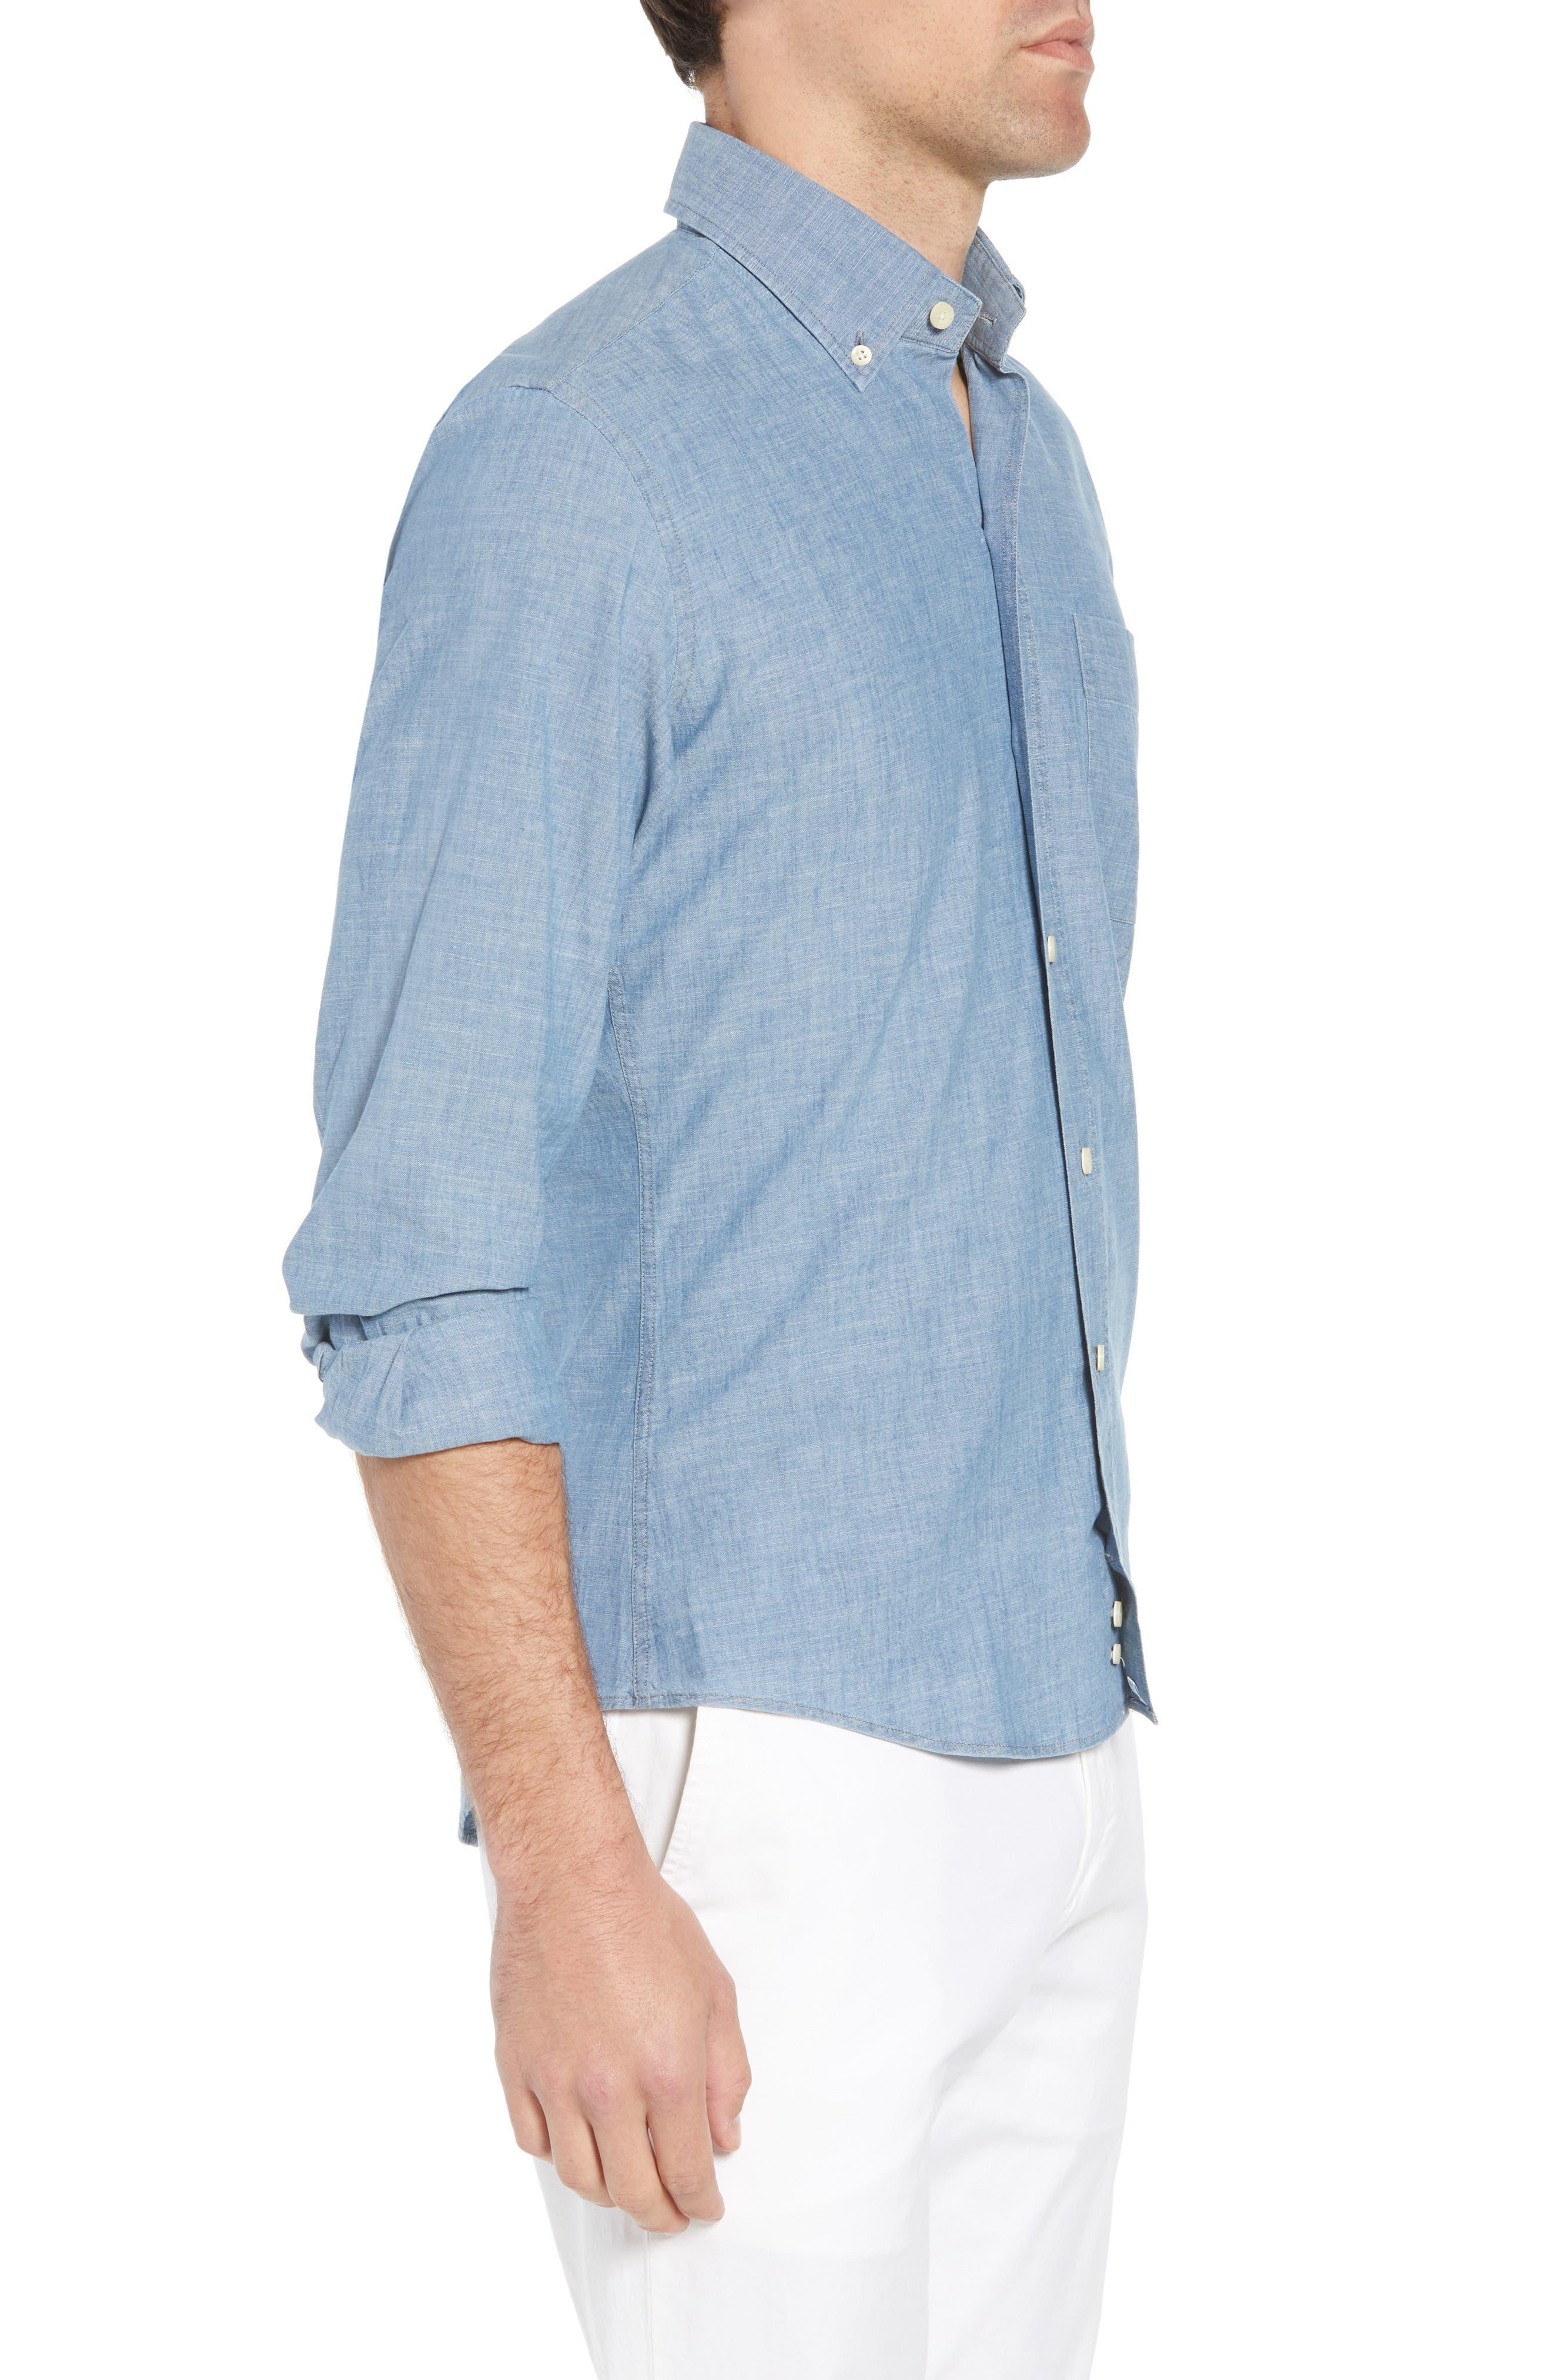 Ancroft Slim Fit Chambray Sport Shirt,                             Alternate thumbnail 3, color,                             Blue